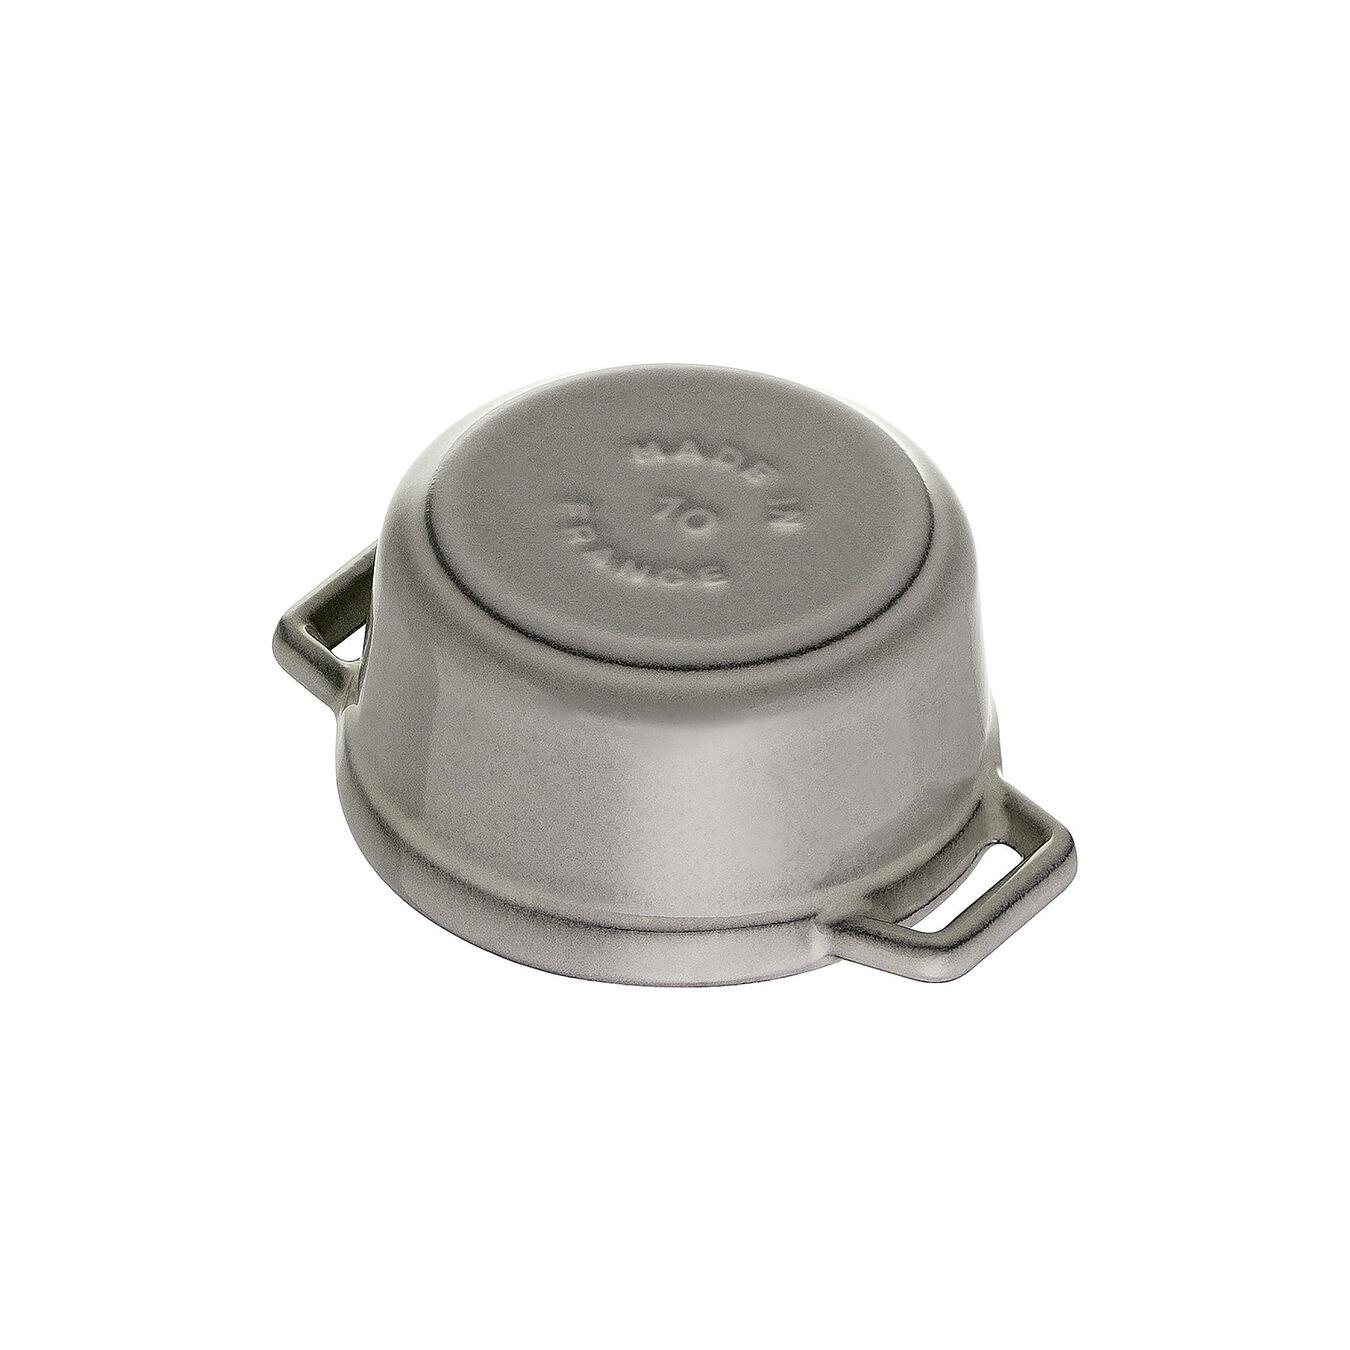 0.25-qt Mini Round Cocotte - Graphite Grey,,large 4